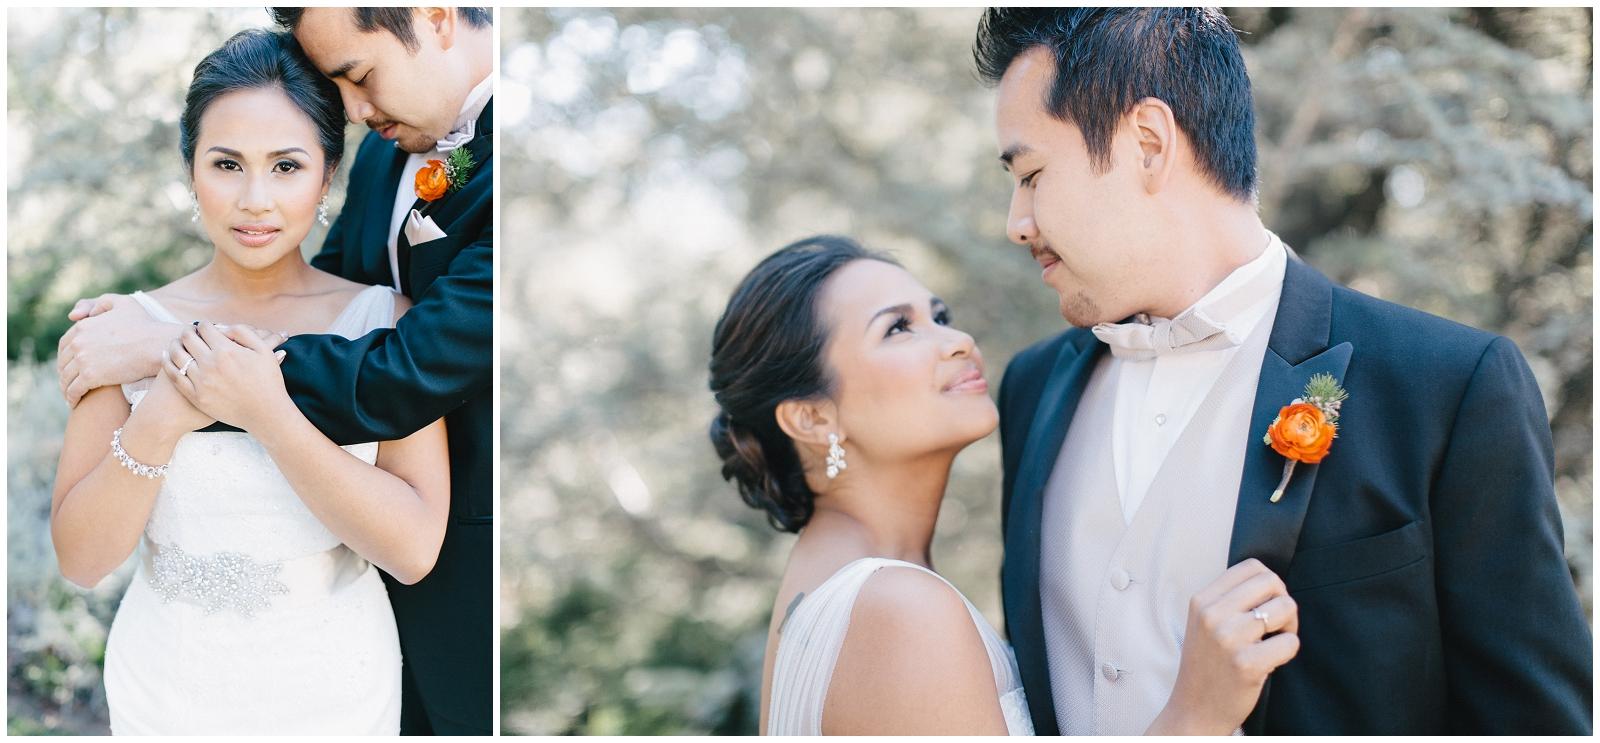 San-Francisco-Bay-Area-Wedding-Photography_Skyline_Church_5.jpg